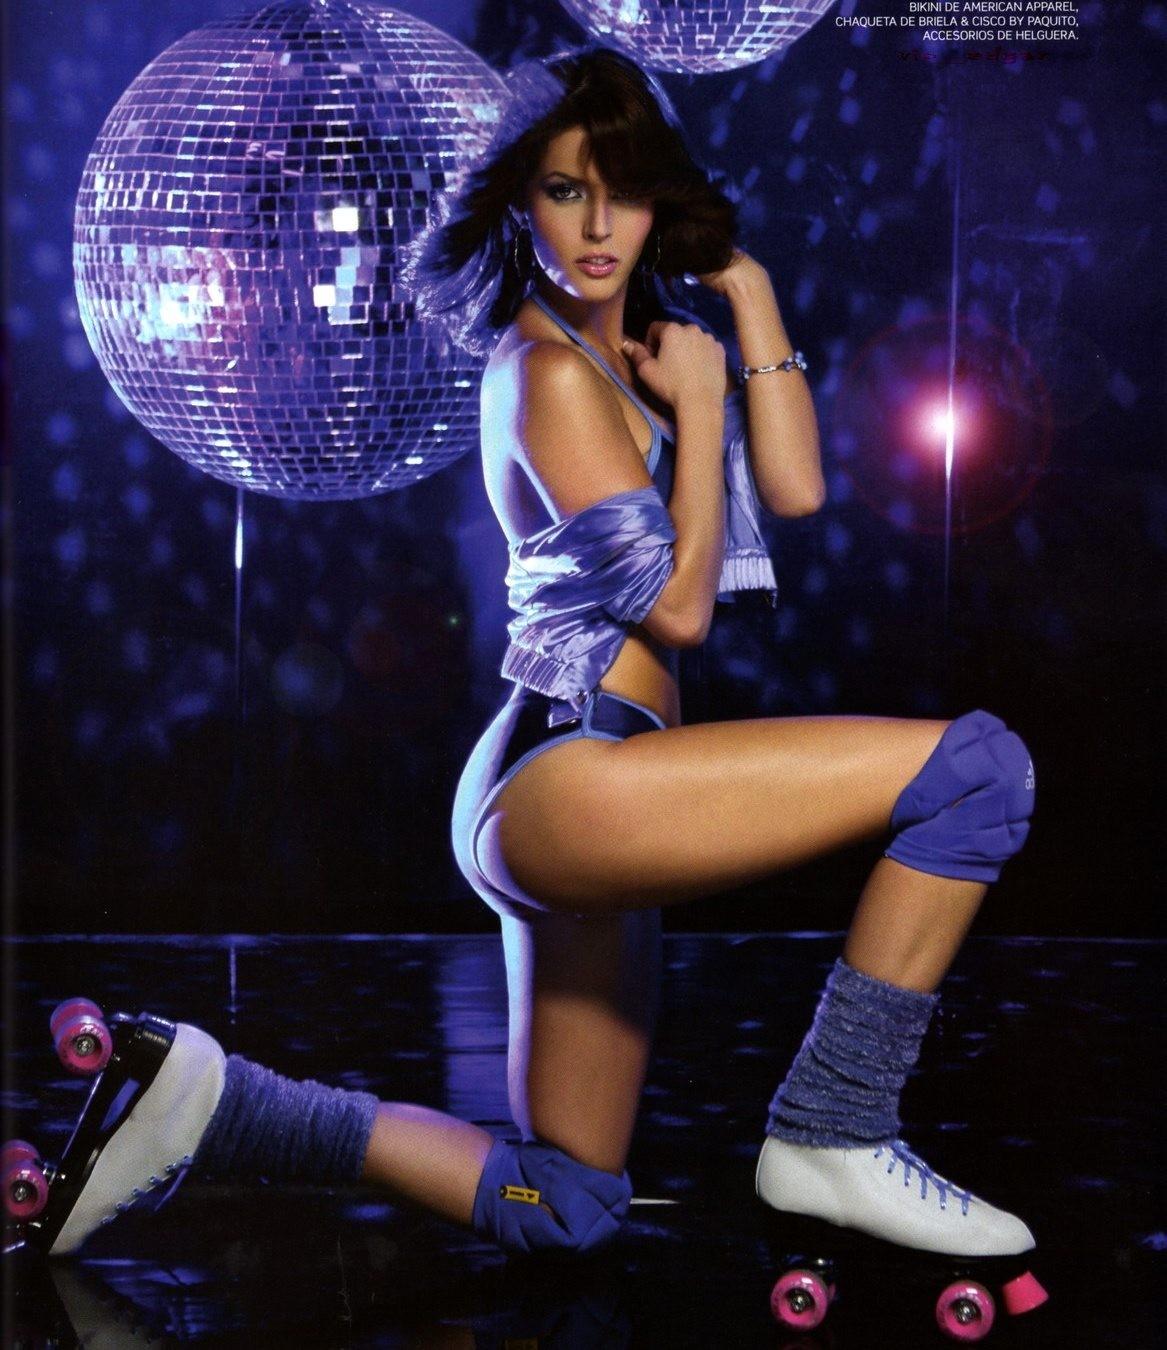 Claudia Alvarez sexo en público